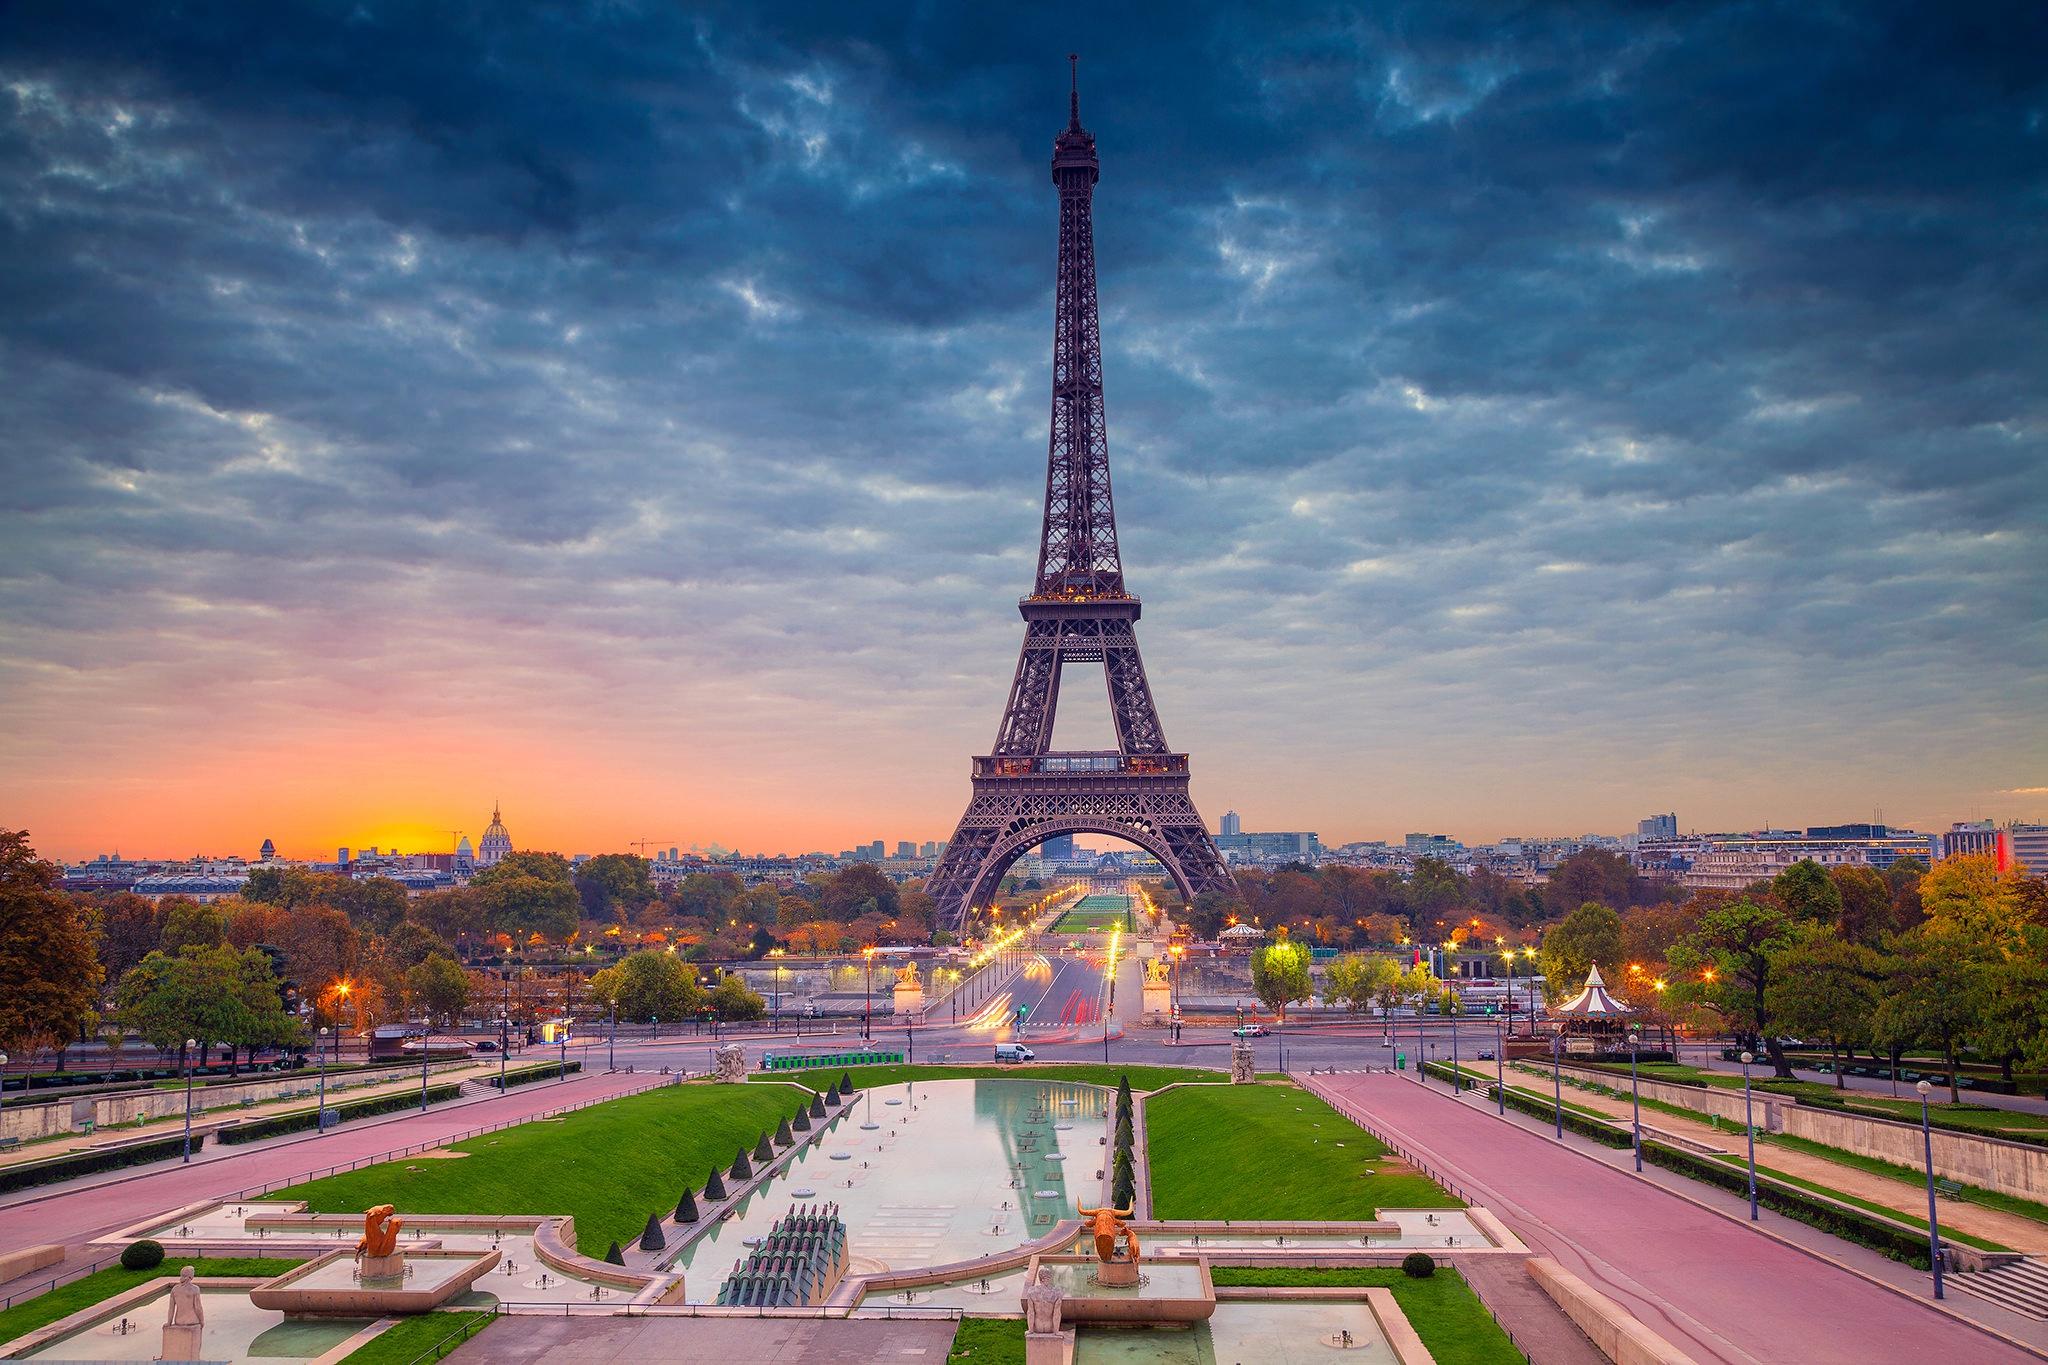 Download Wallpaper Paris Cute 1920x1080 Eiffel Tower Paris Beautiful View Laptop Full Hd